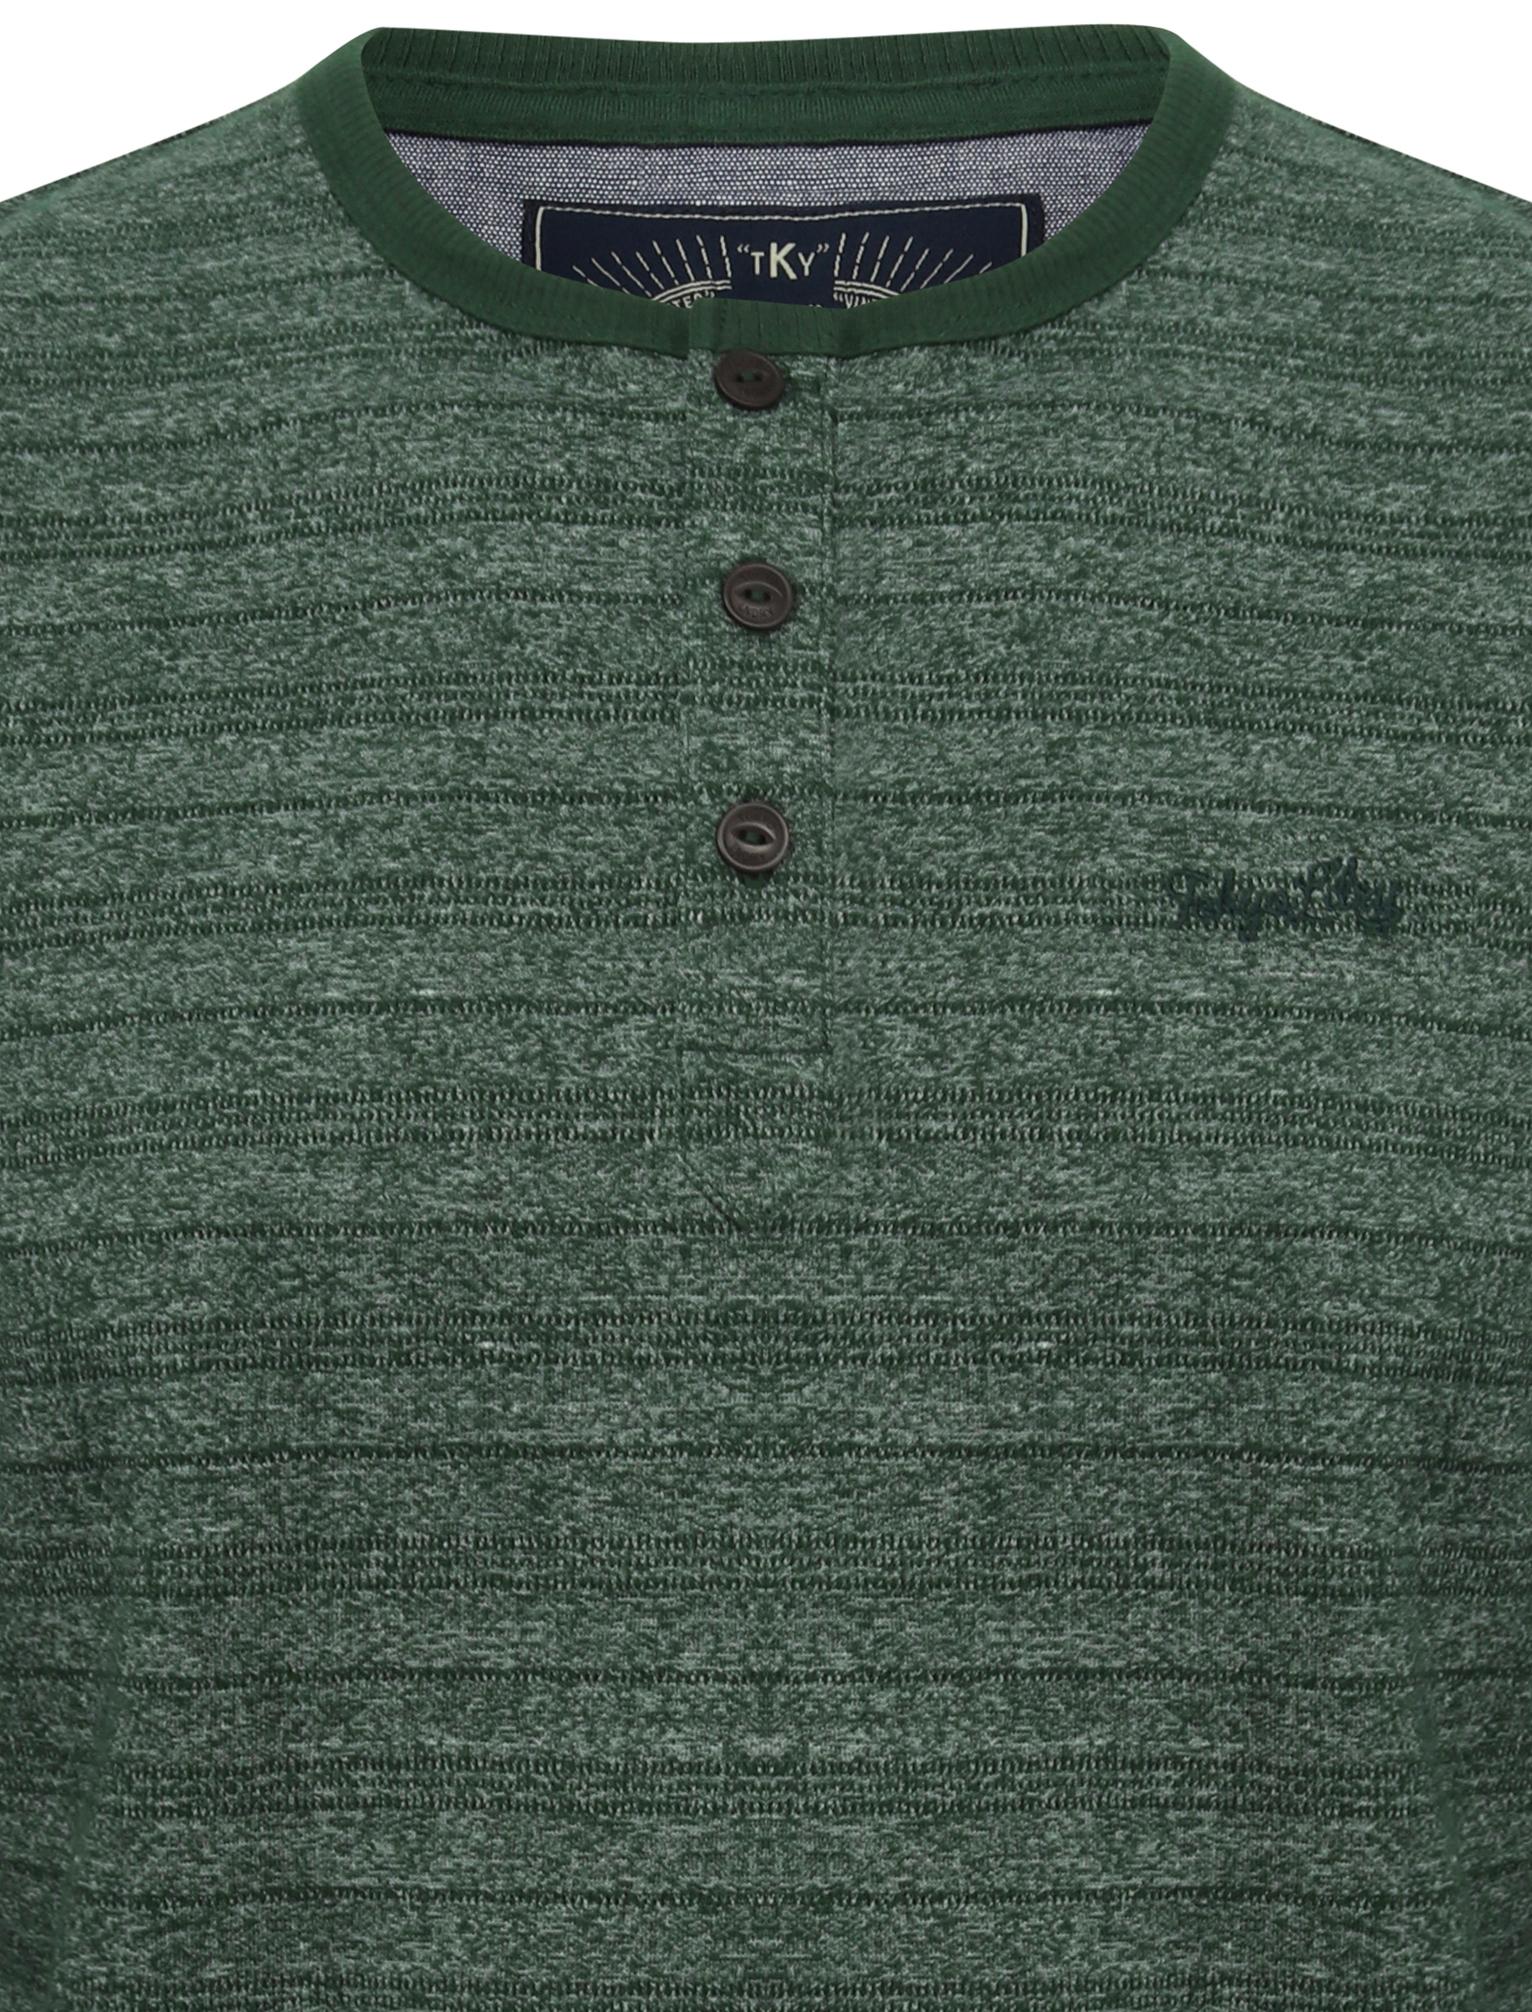 Tokyo-Laundry-Men-Hoaden-Crew-Neck-Long-Sleeve-T-Shirt-Top-Henley-Grandad-Collar thumbnail 14